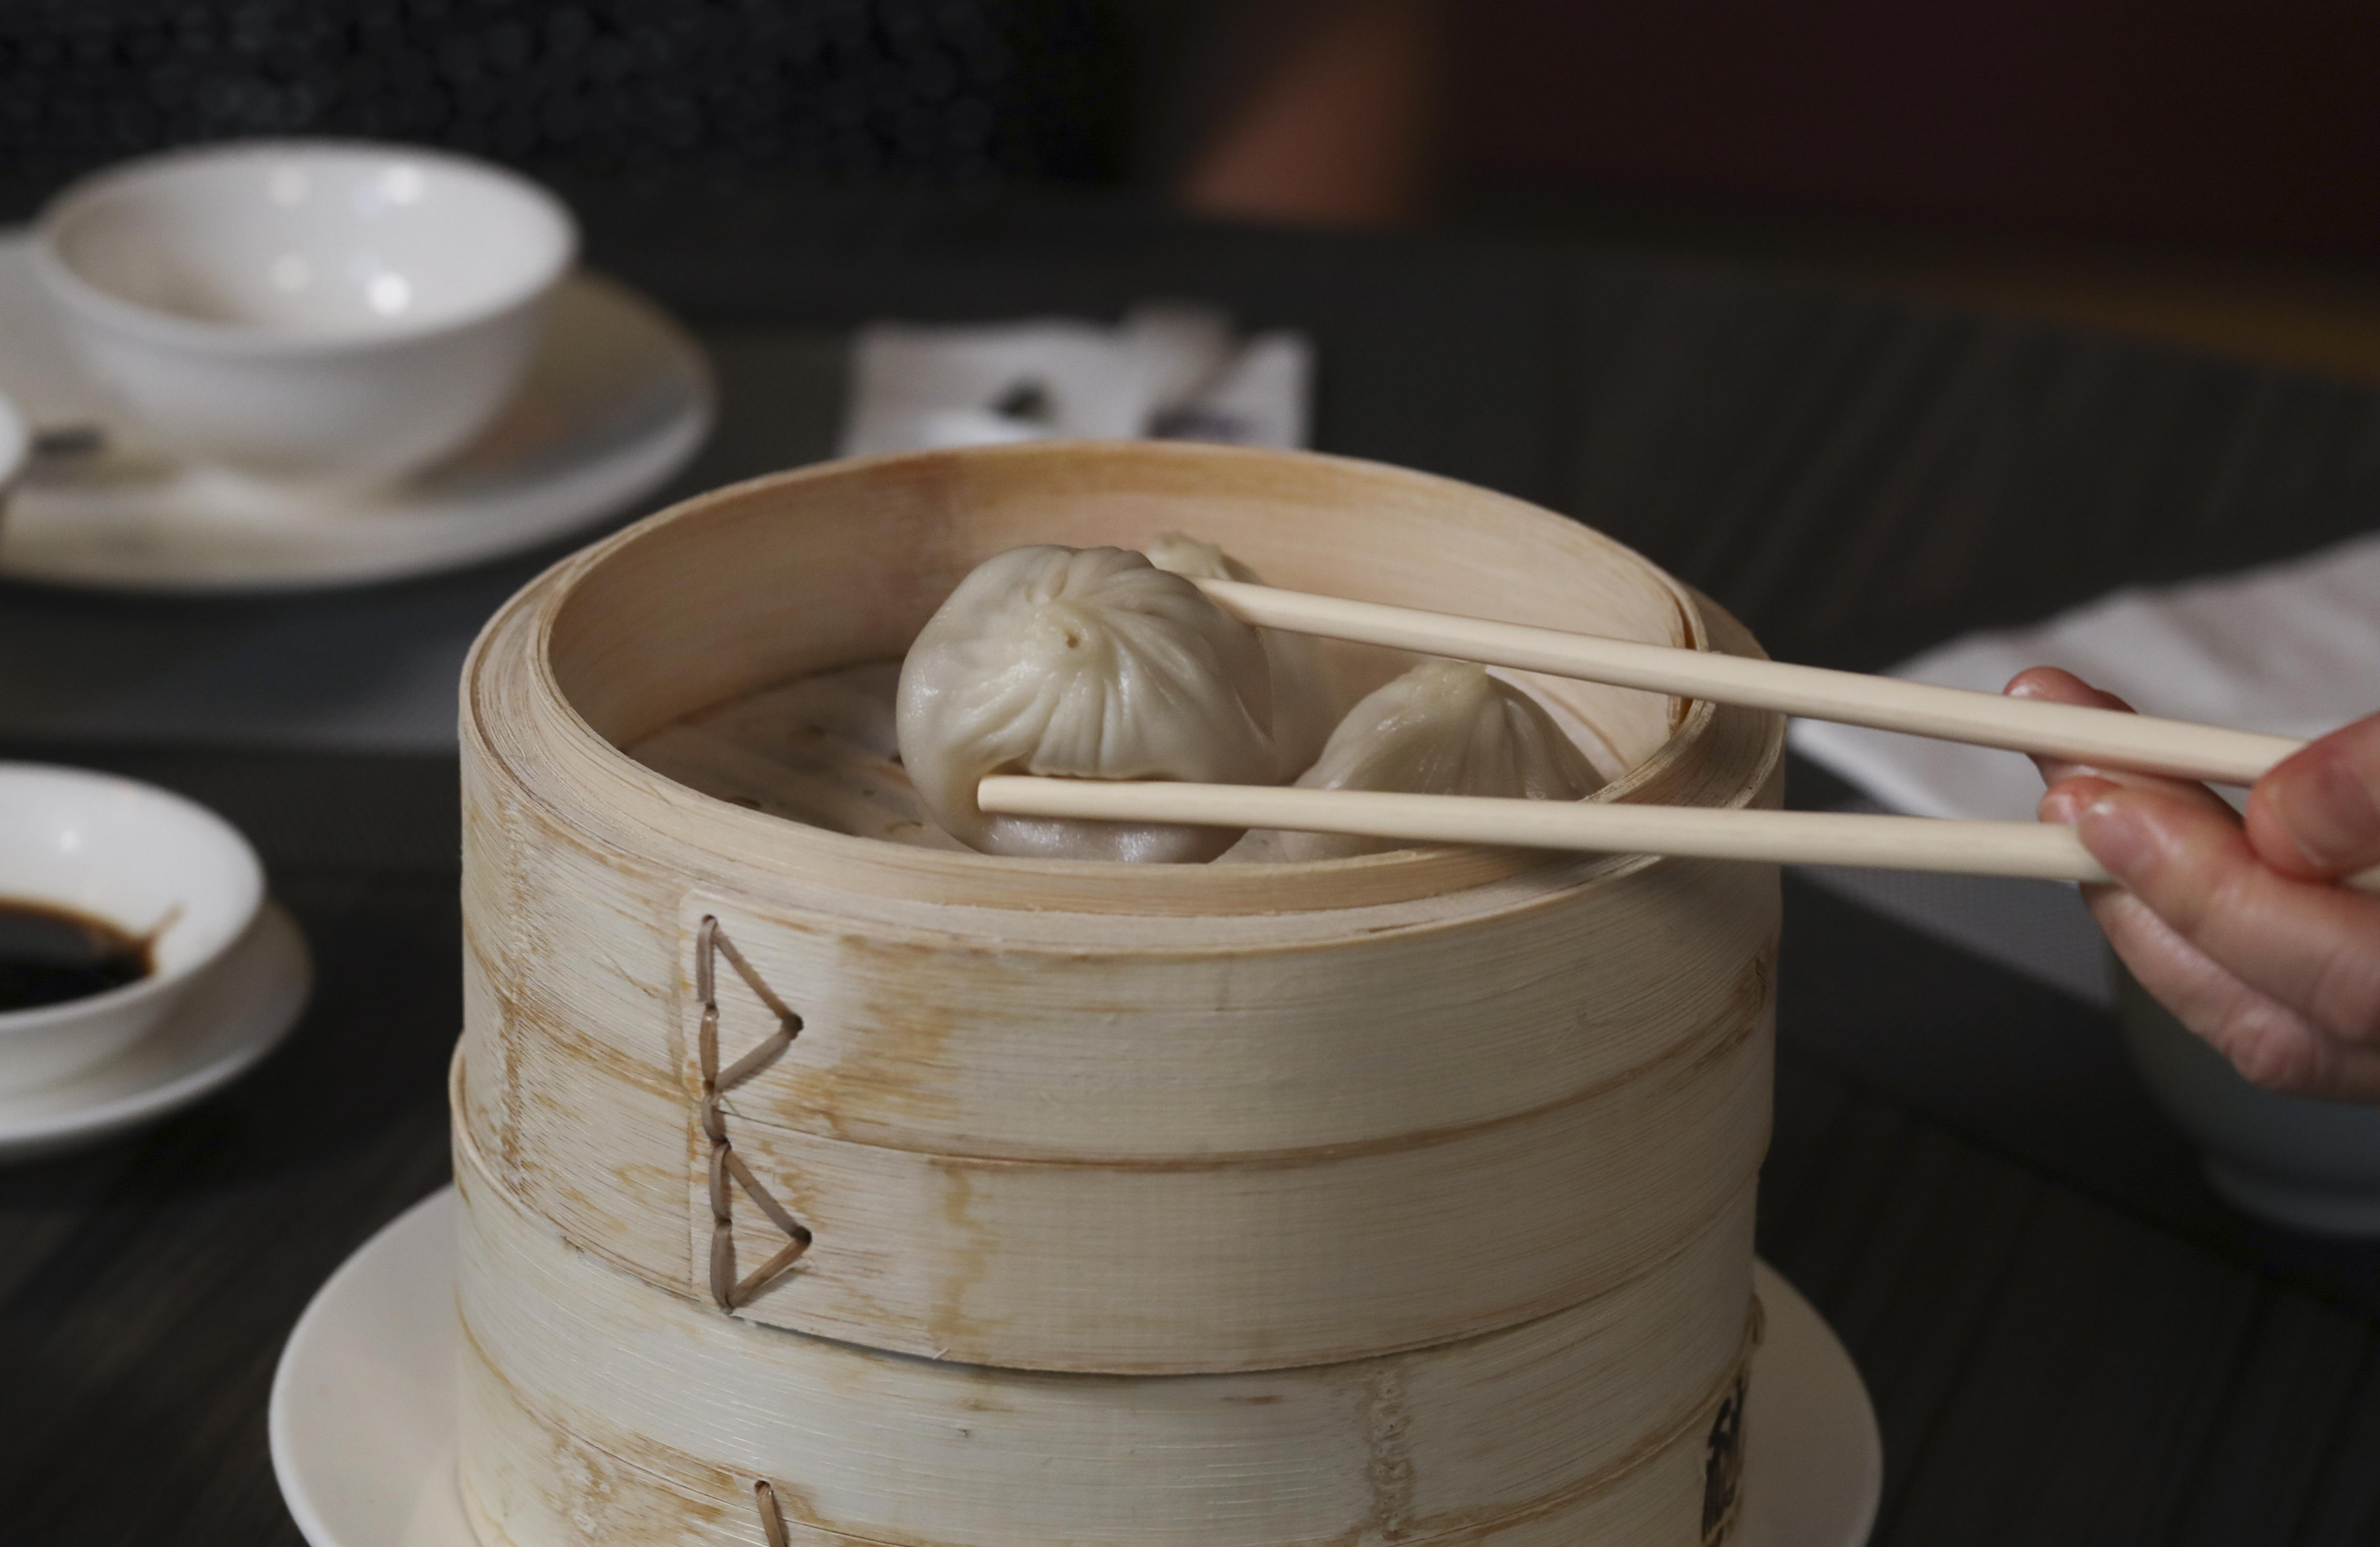 Different ways to eat Xiaolong Bao, at Crystal Jade Jiang Nan Shop 310, Tai Yau Building, 181 Johnston Road, Wan Chai. in Hong Kong on June 13 2017. 13JUN17 [FEATURES] SCMP / Nora TAM